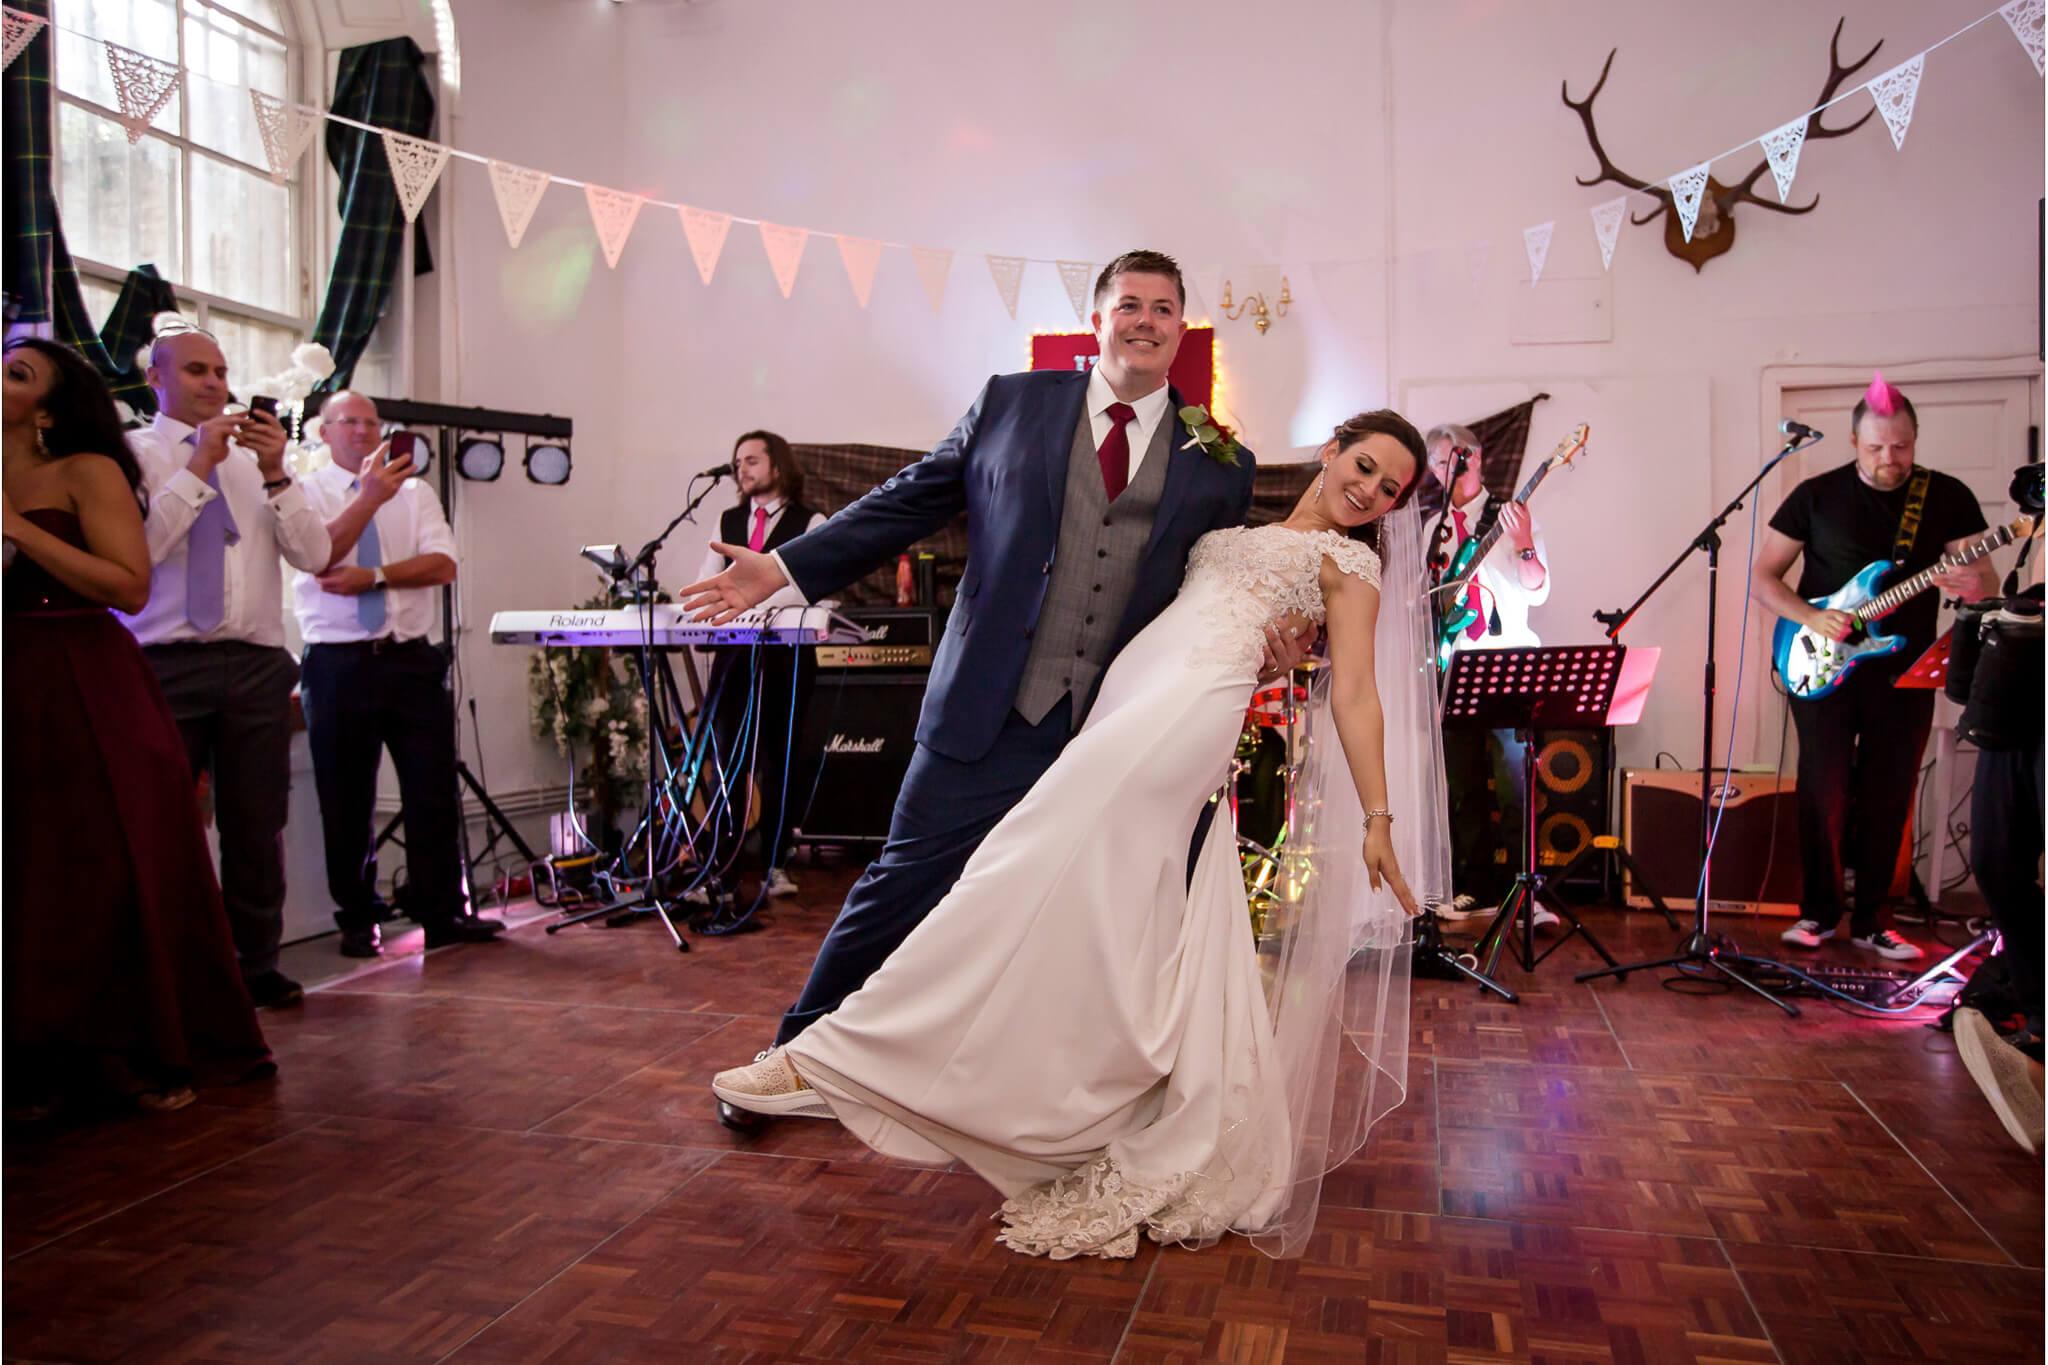 duns-castle-wedding-photograper-scotland-stanbury-photography-022